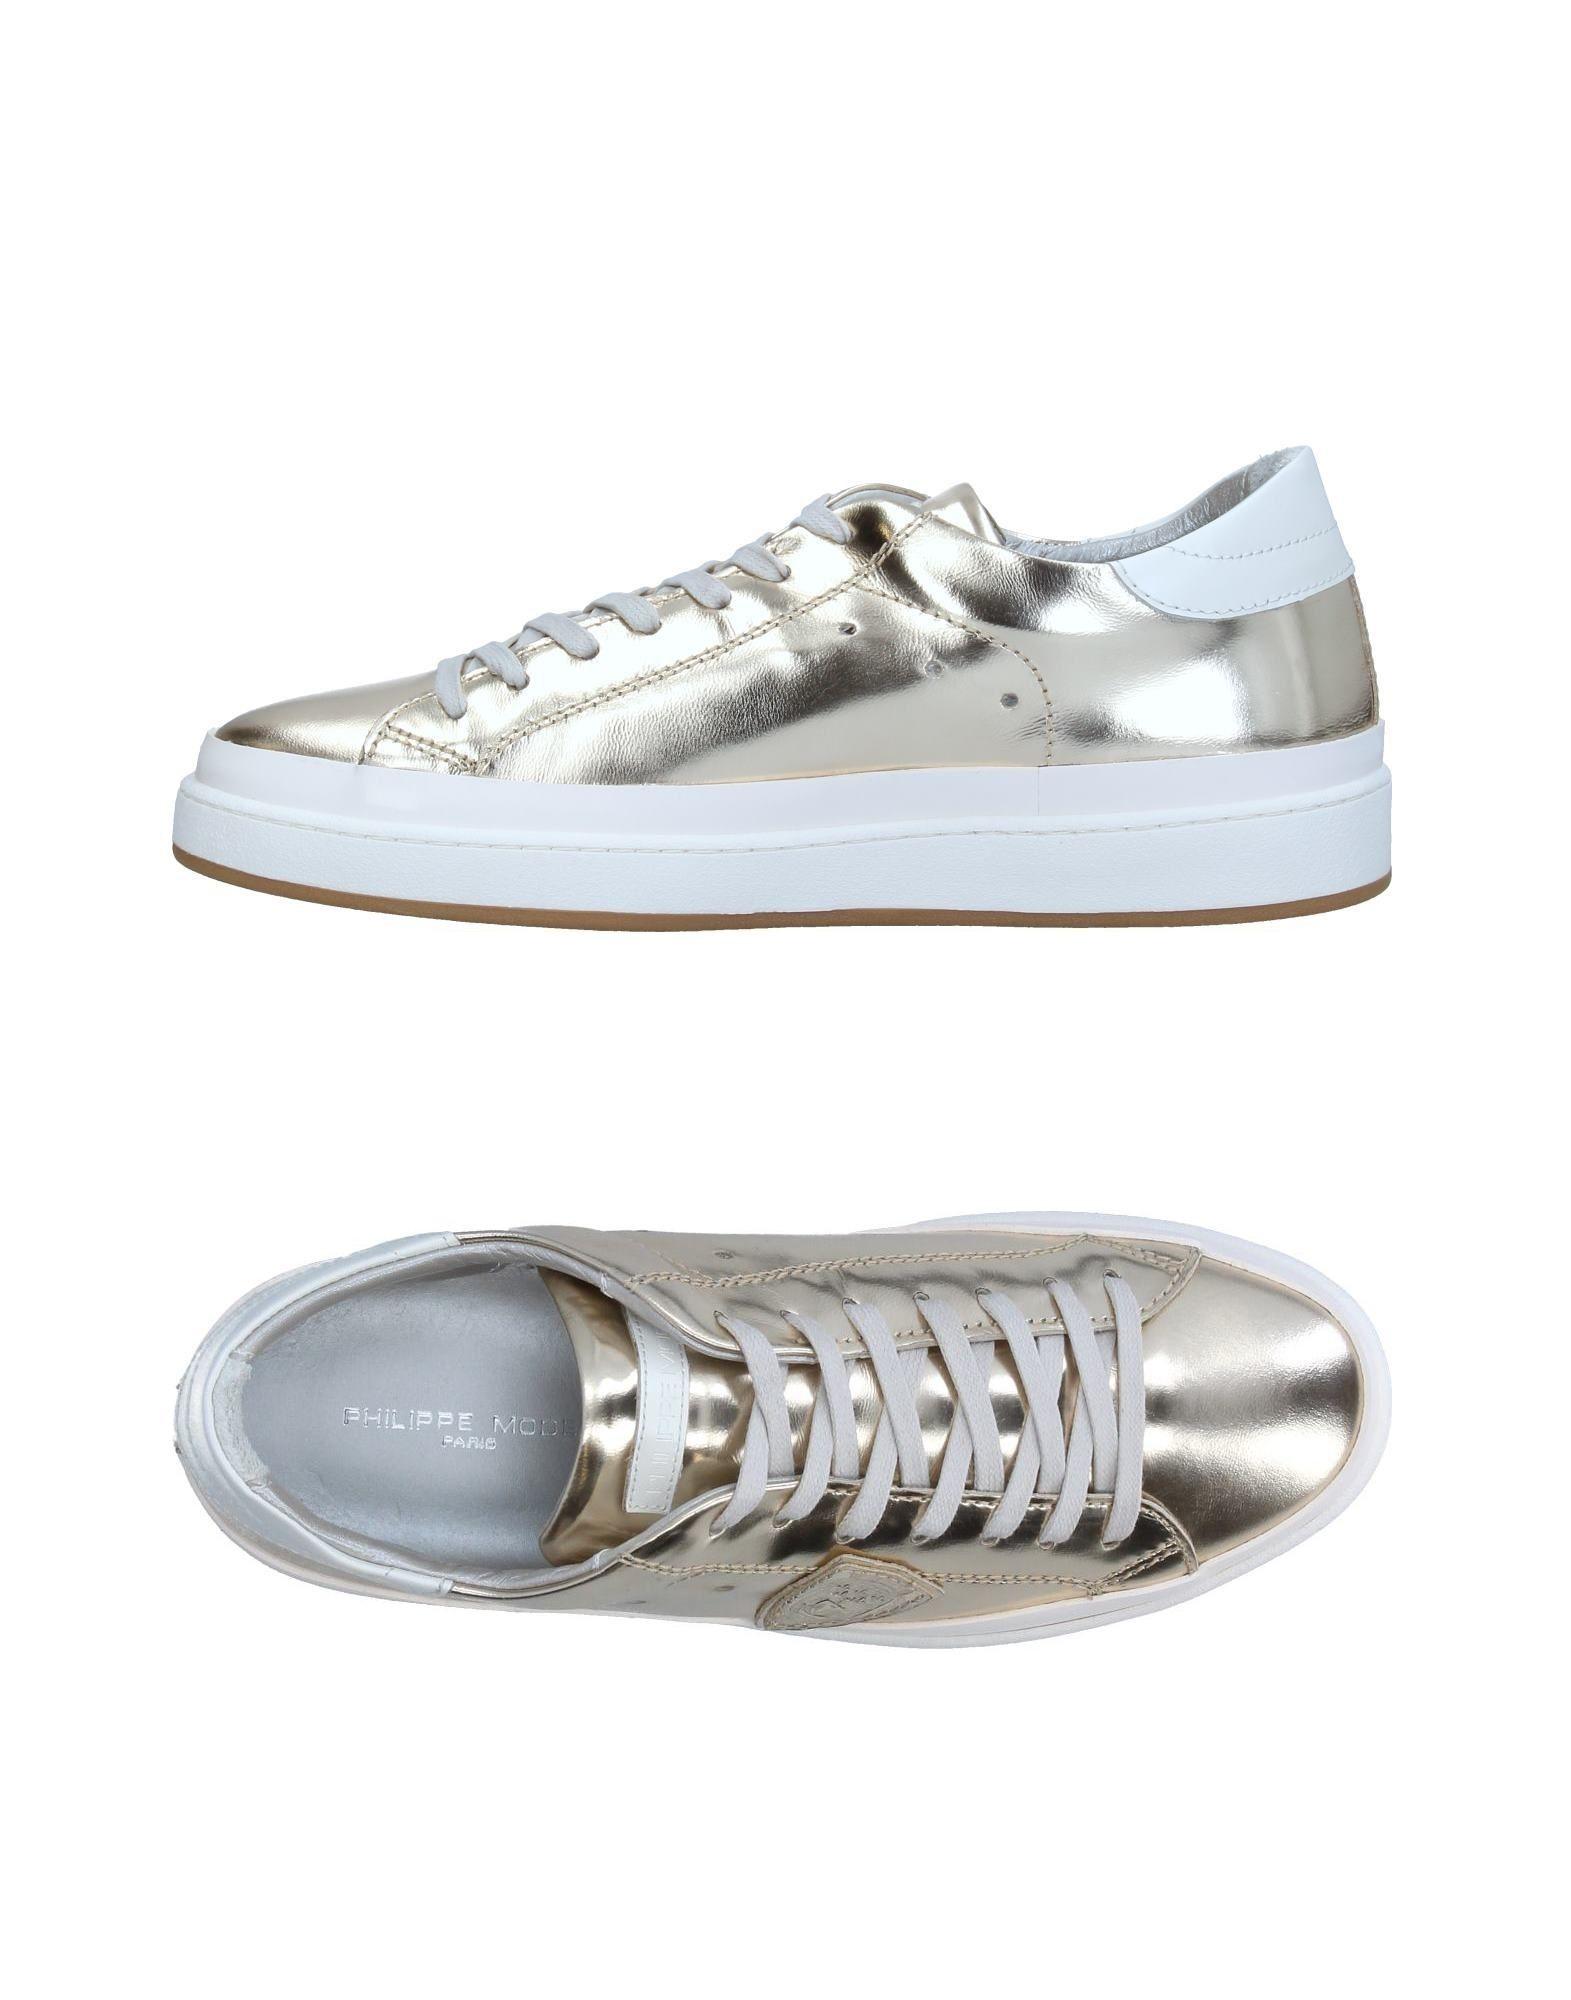 Philippe Model Sneakers Herren  11354527AS Gute Qualität beliebte Schuhe